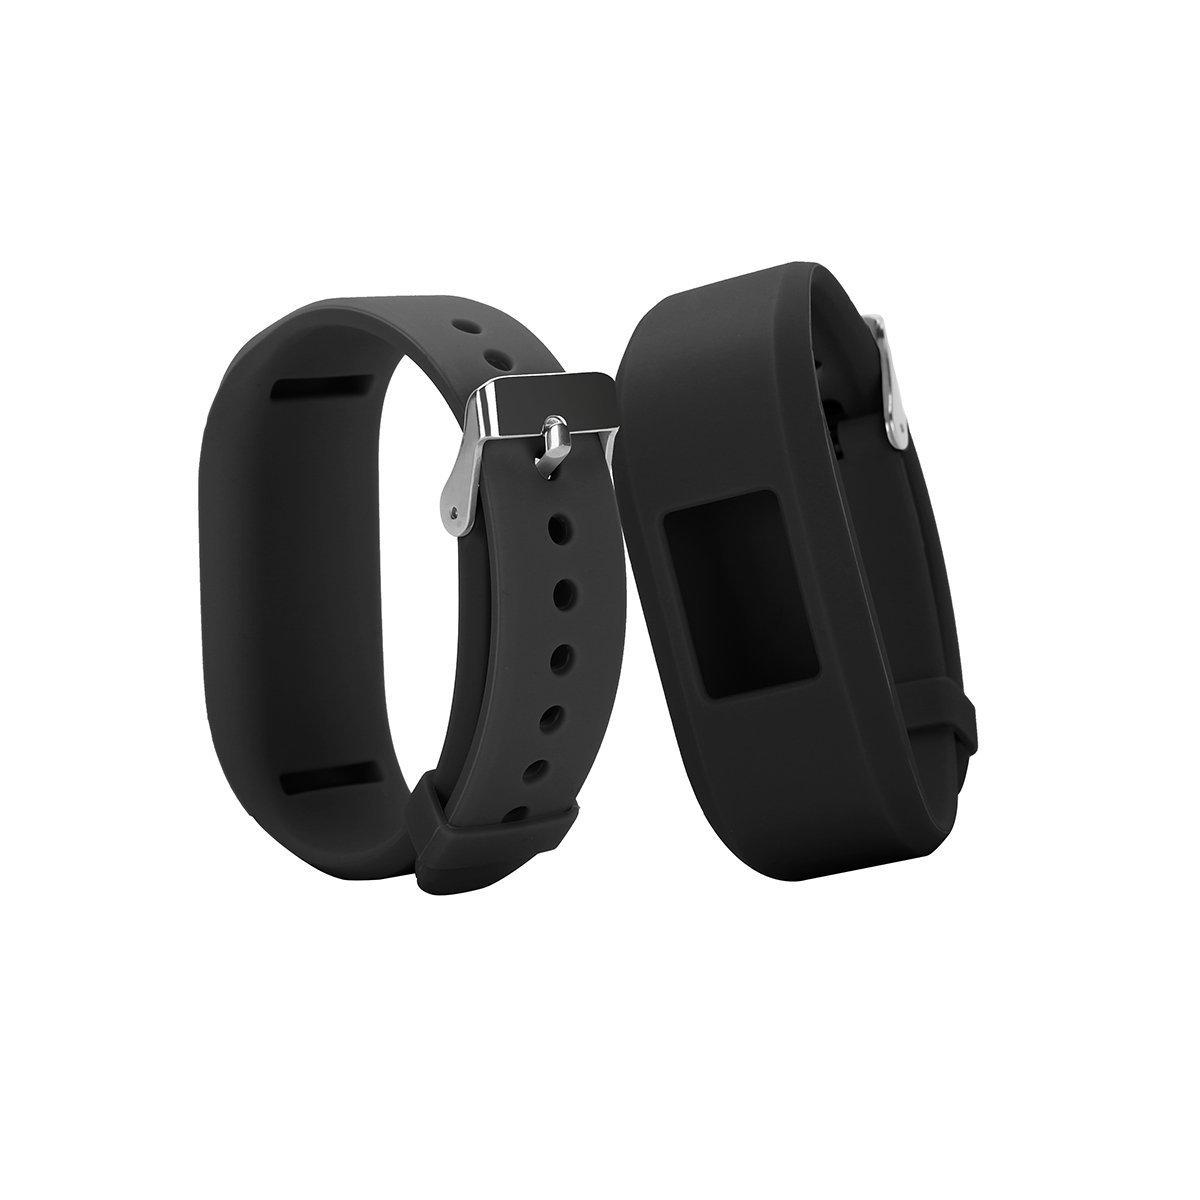 TenYun Replacement Silicon Bracelet Strap for Garmin Vivofit JR Fitness Bands 10-Pack ECSEM